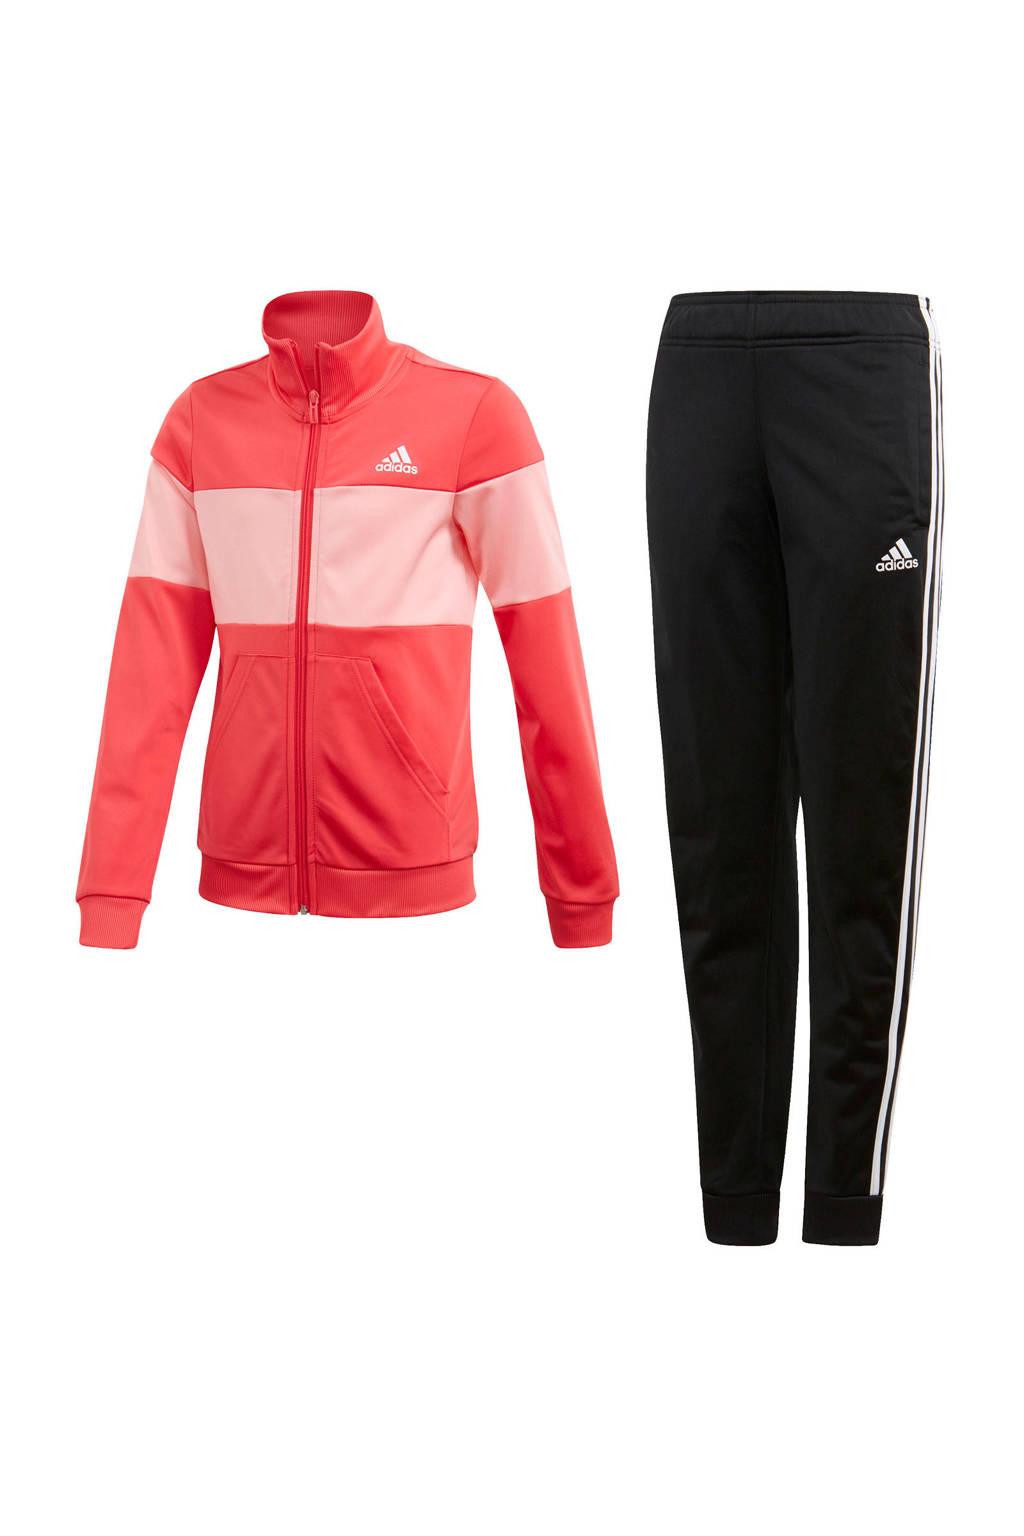 adidas trainingspak zwart/roze, Zwart/roze